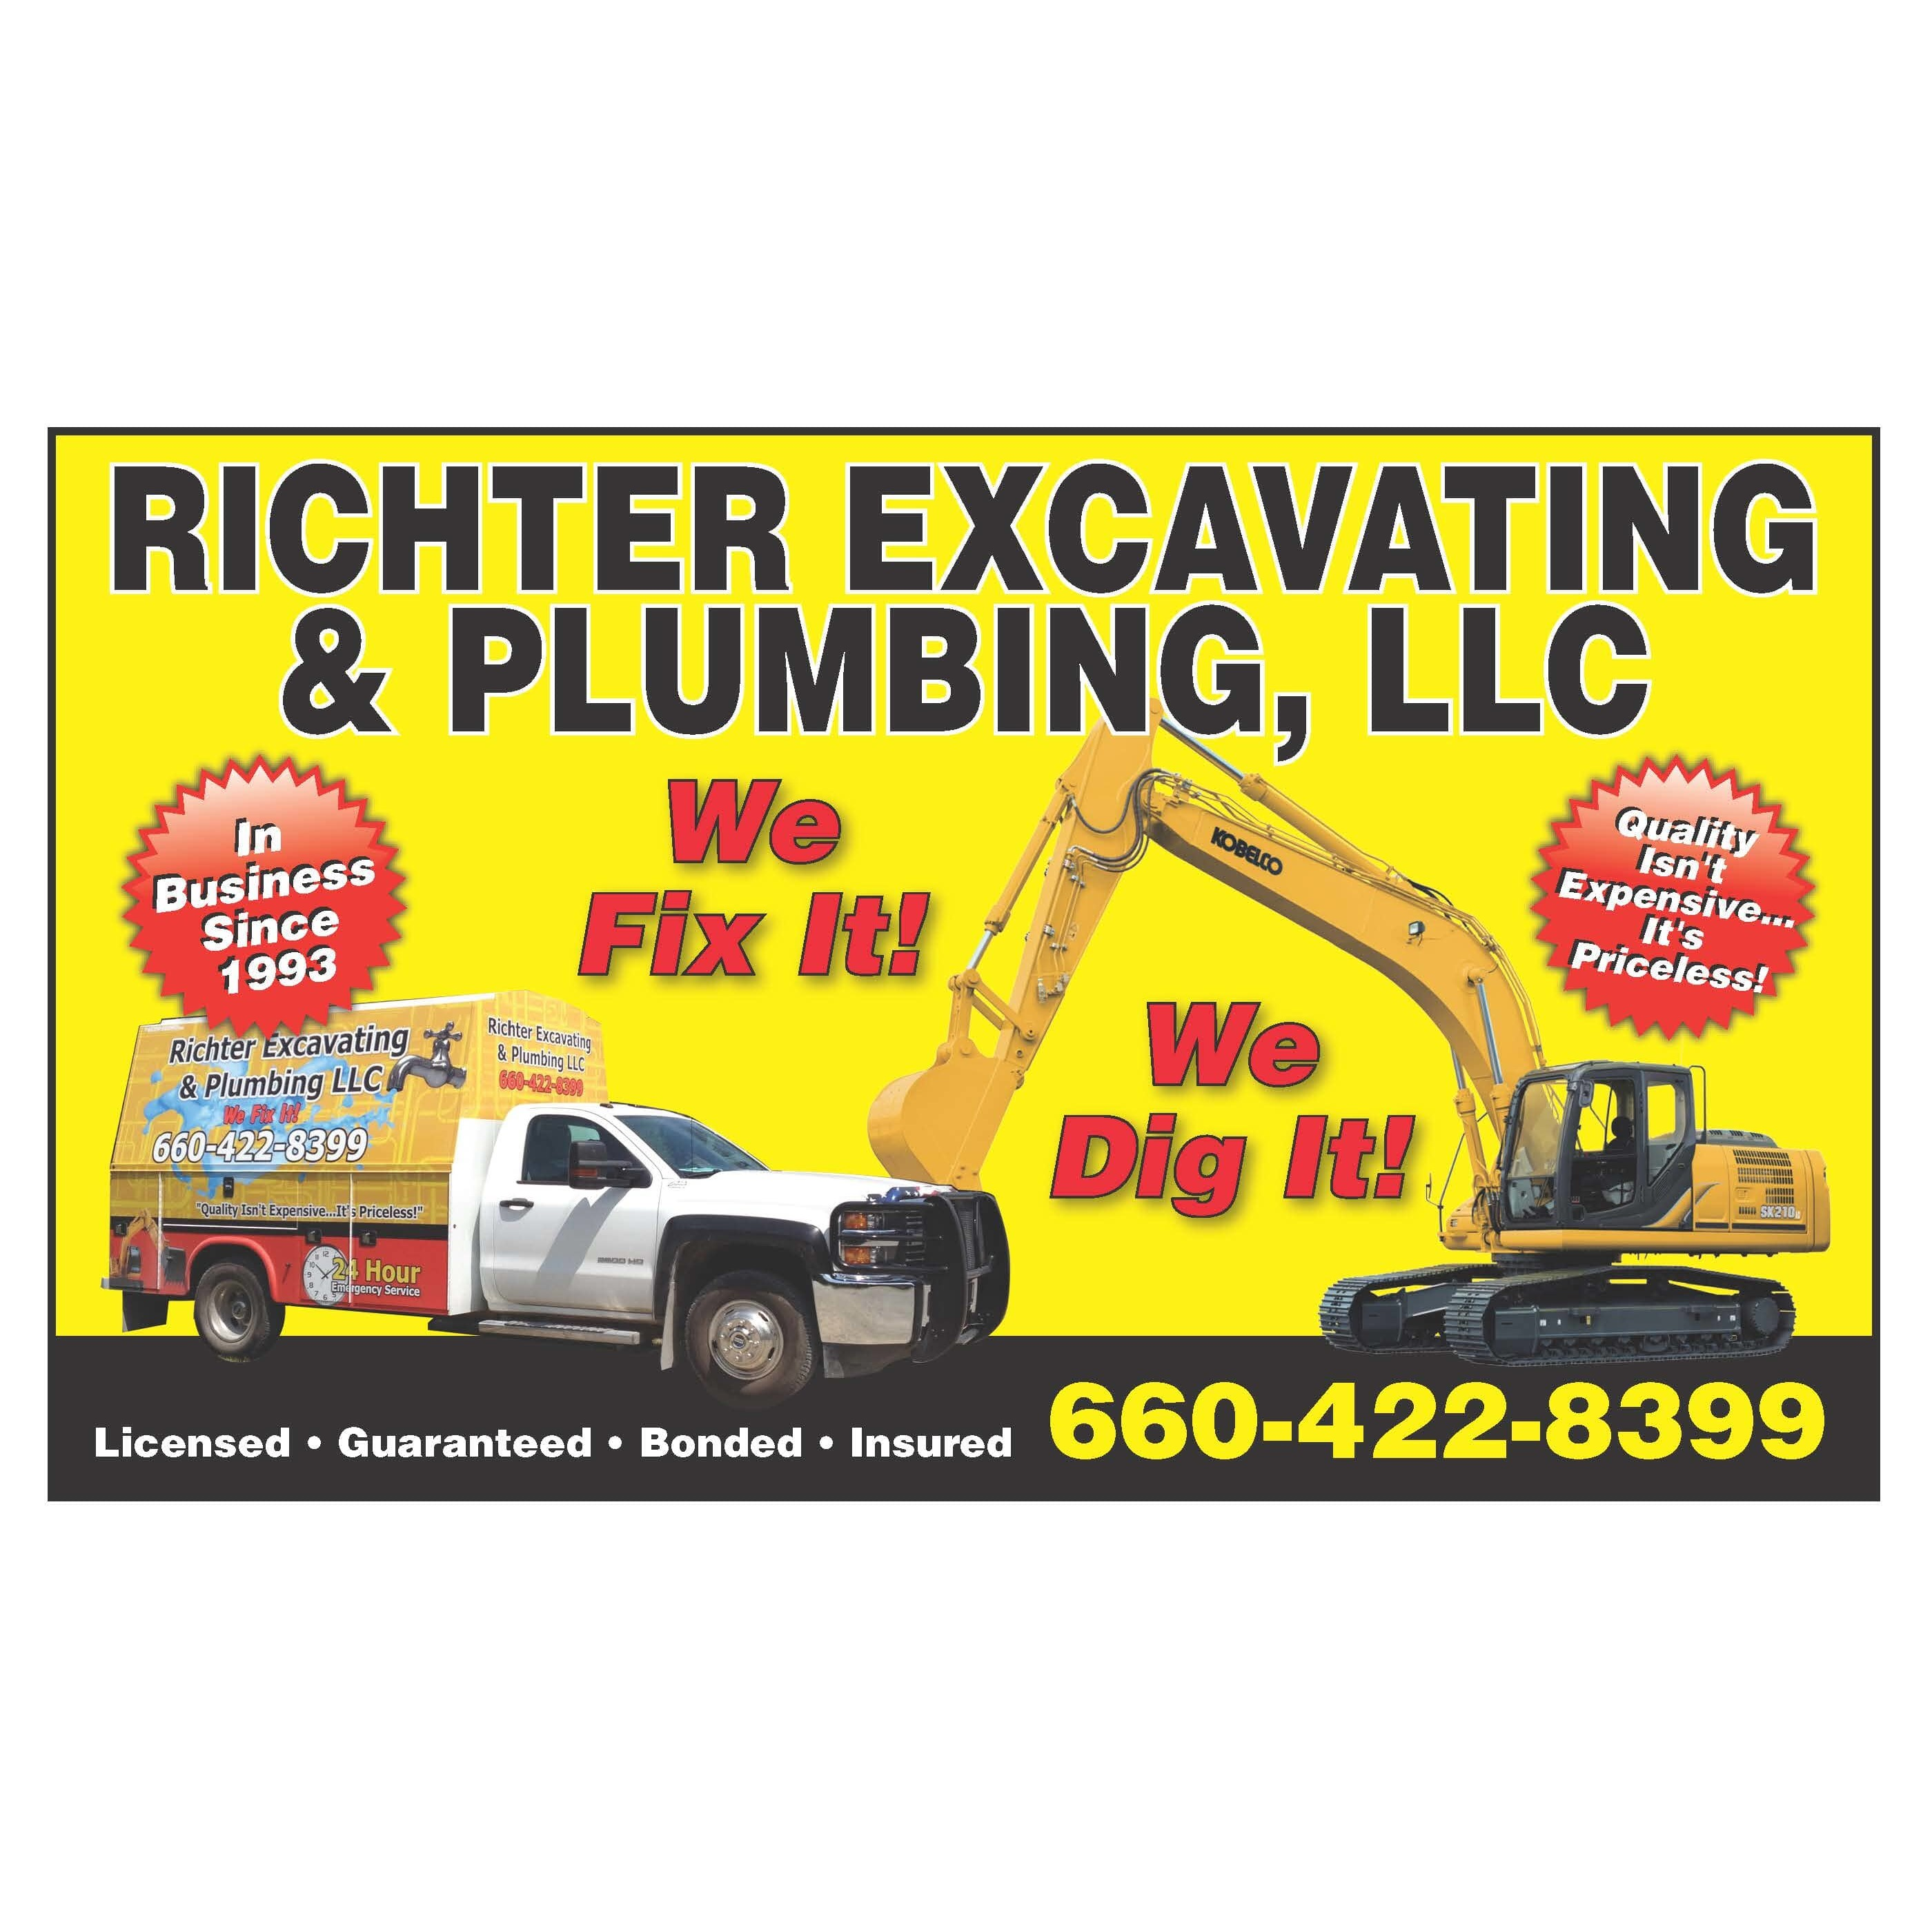 Richter Excavating & Plumbing LLC image 9